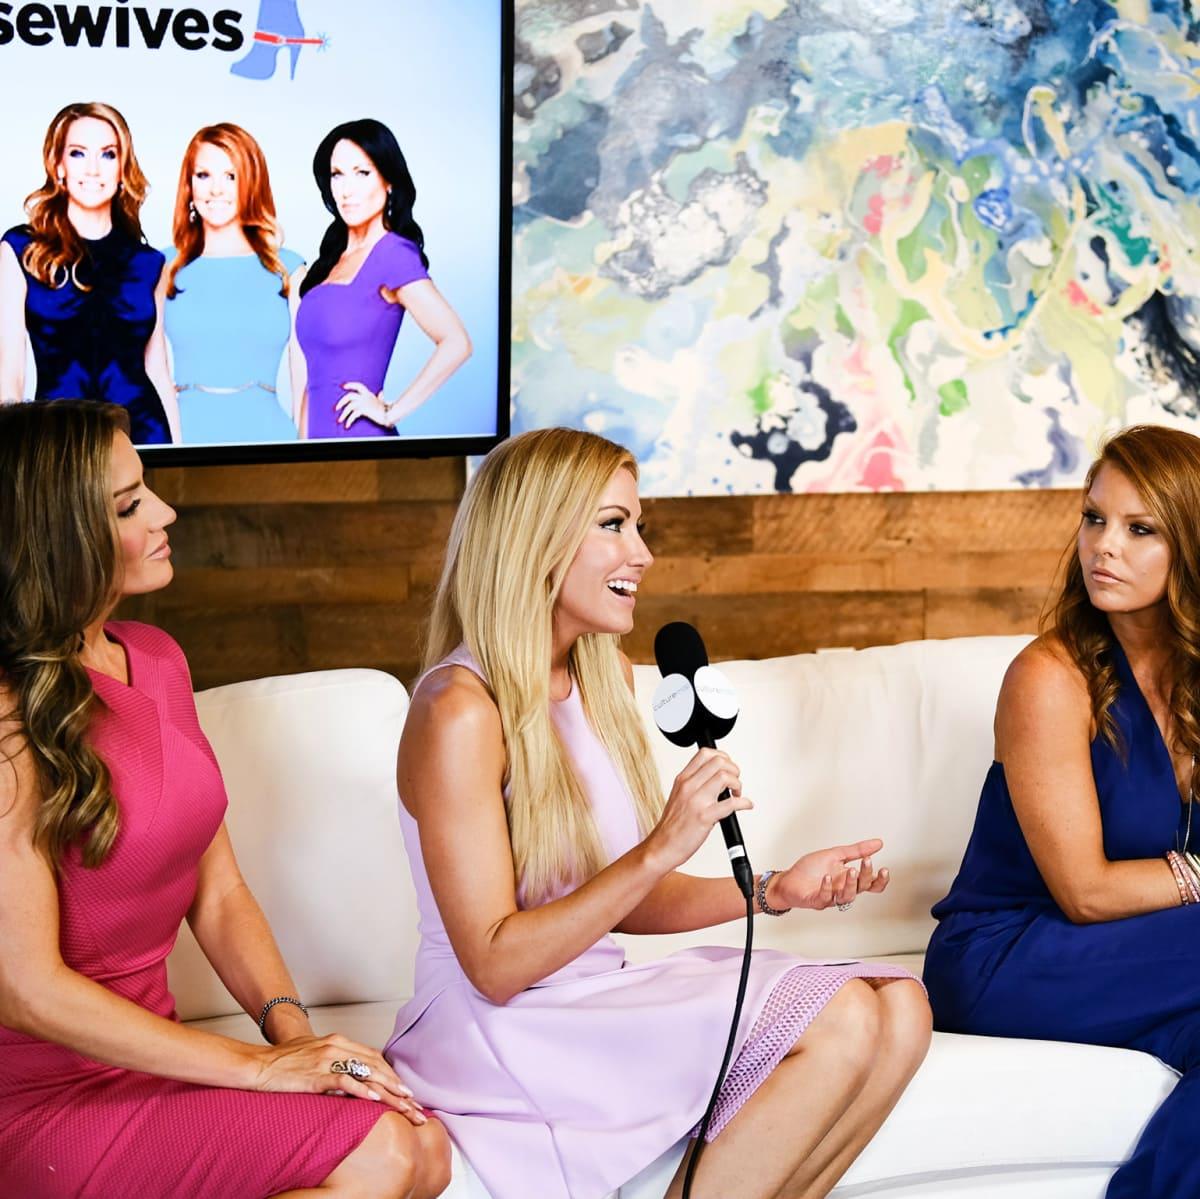 Real Housewives of Dallas Stephanie Hollman, Brandi Redmond, Cary Deuber